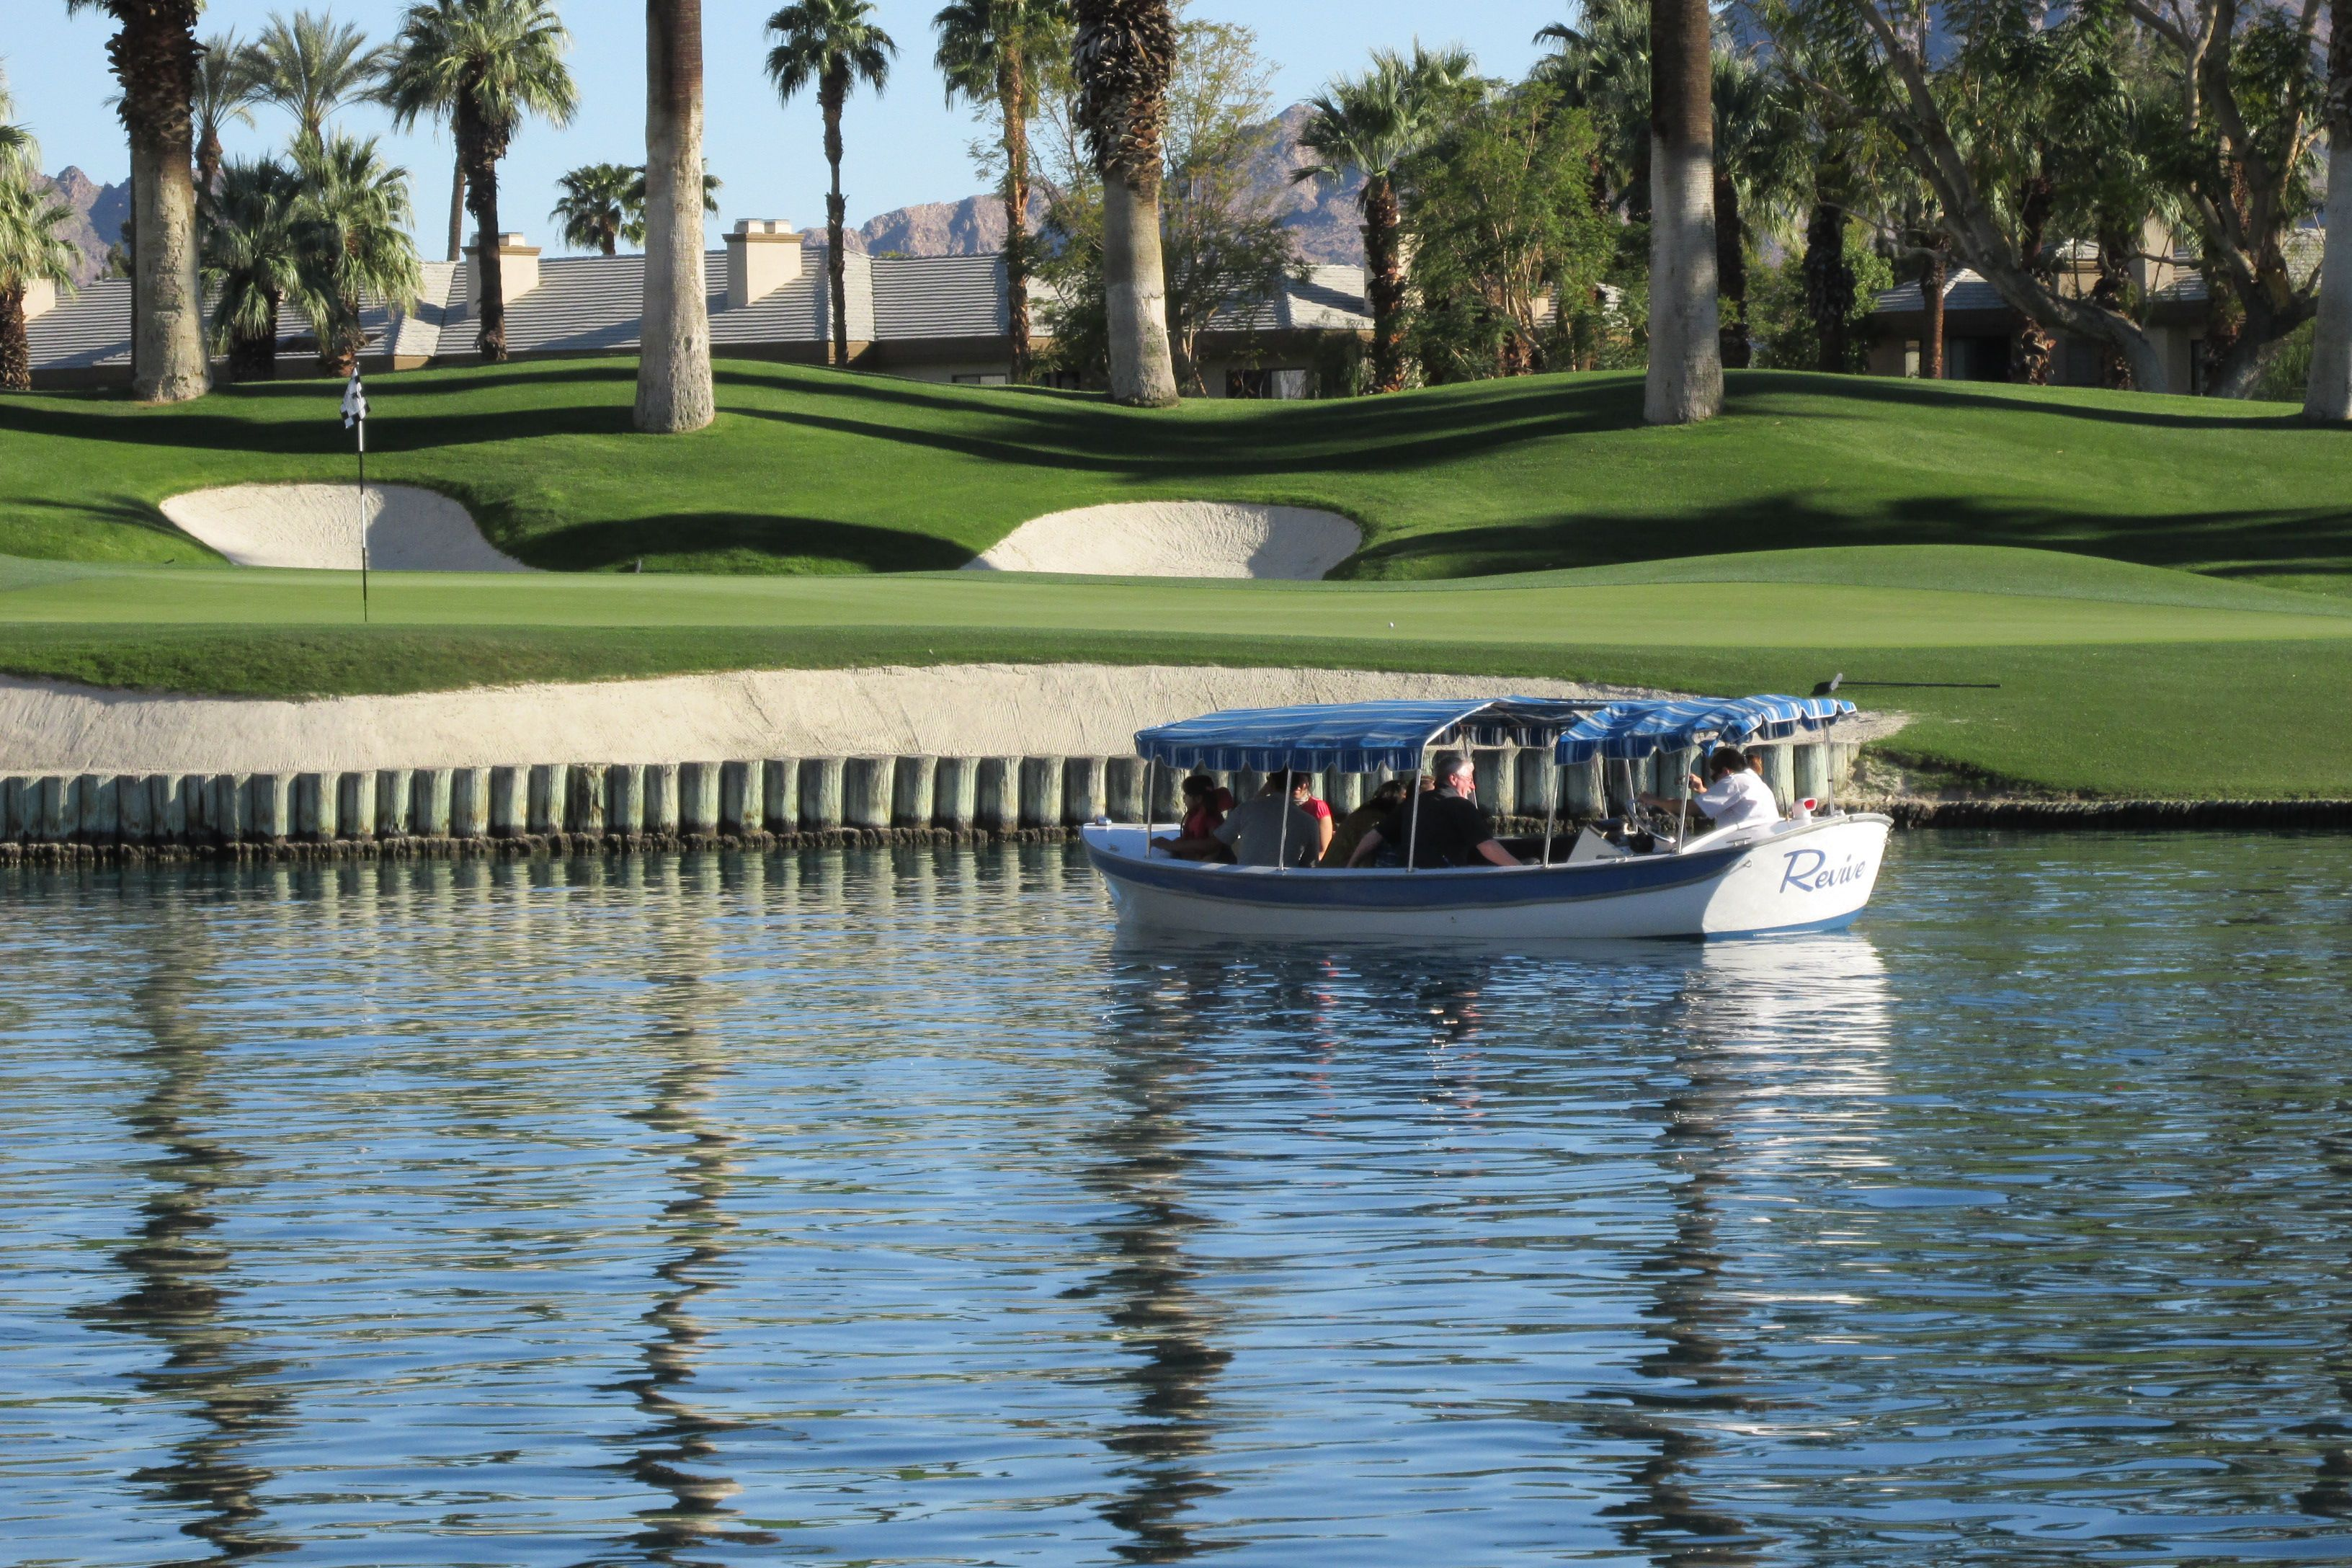 Gondola rides JW Marriott, Palm Desert | Places To Go | Pinterest ...